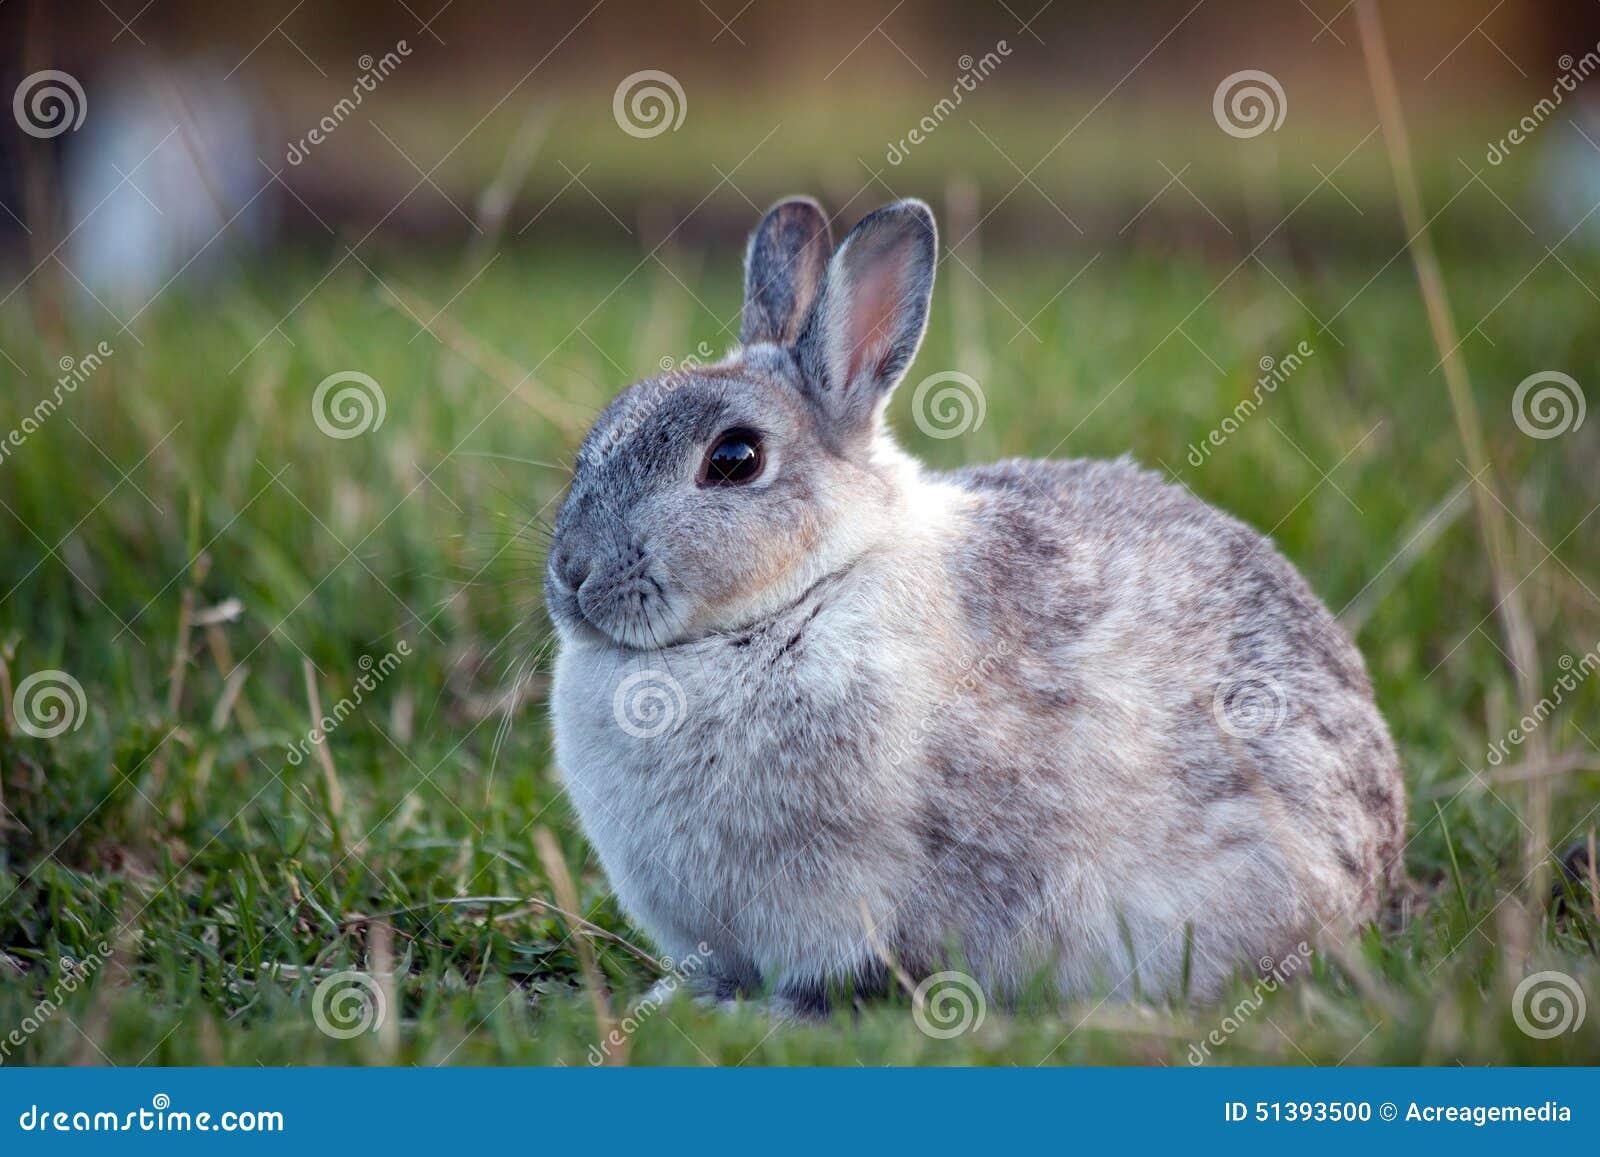 Bbw rabbit